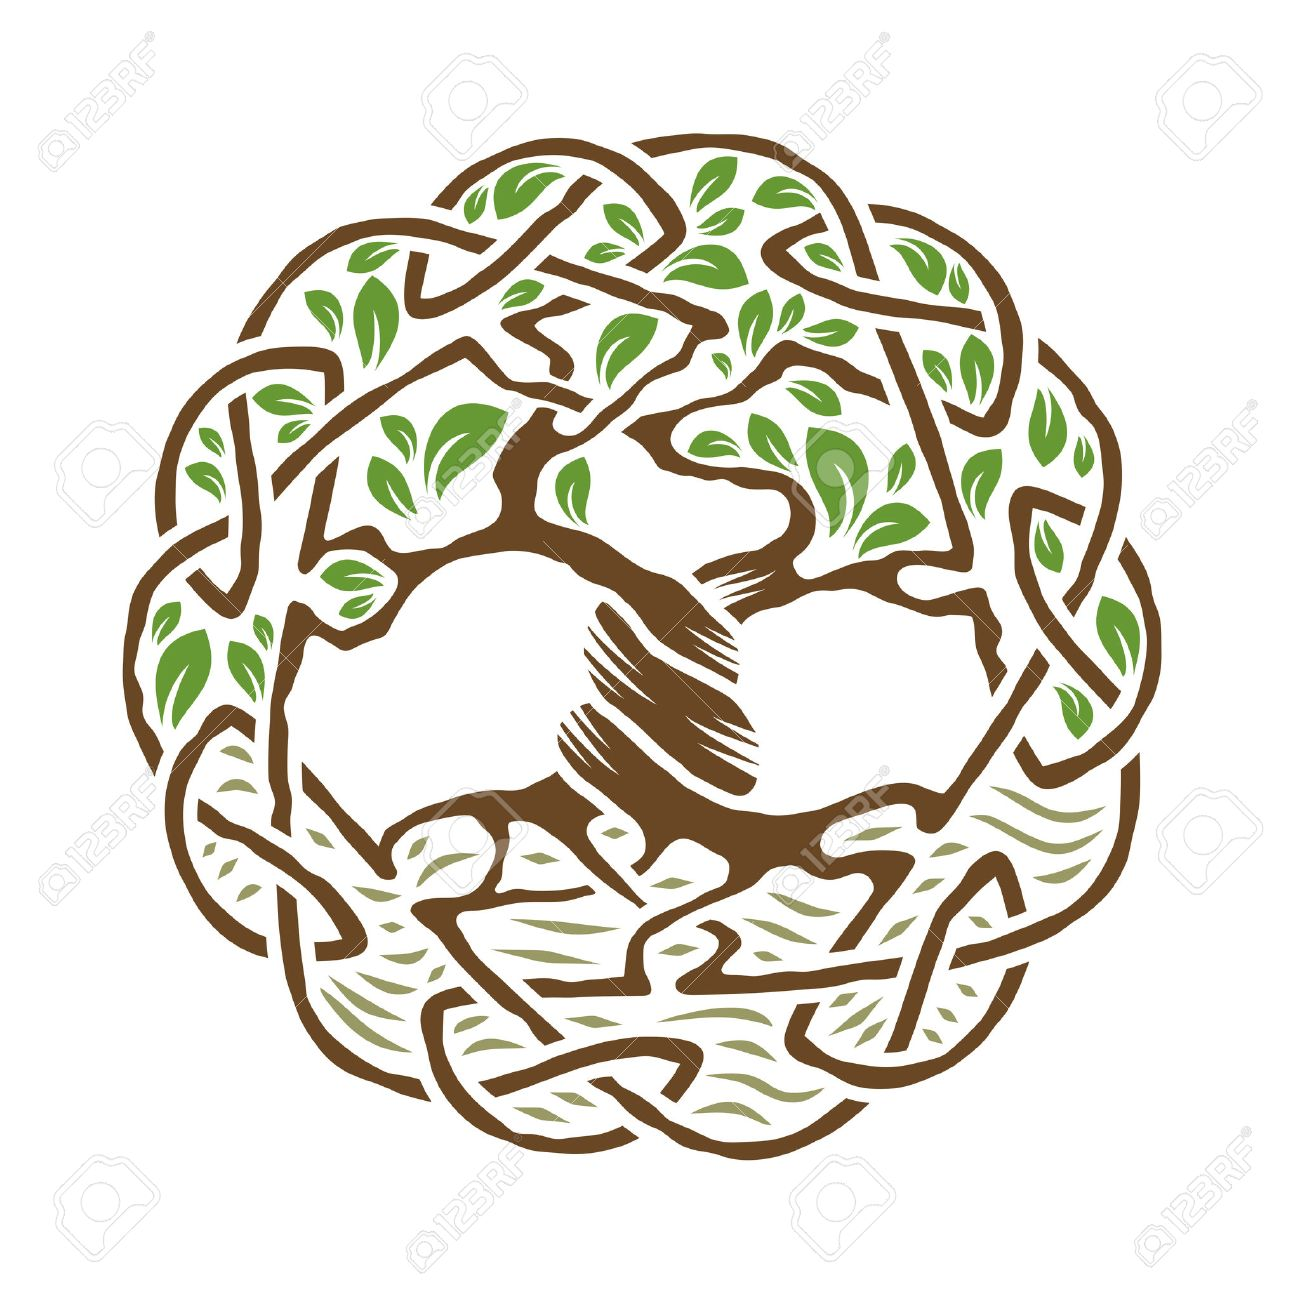 Illustration of celtic tree of life, color version, vector illustration.